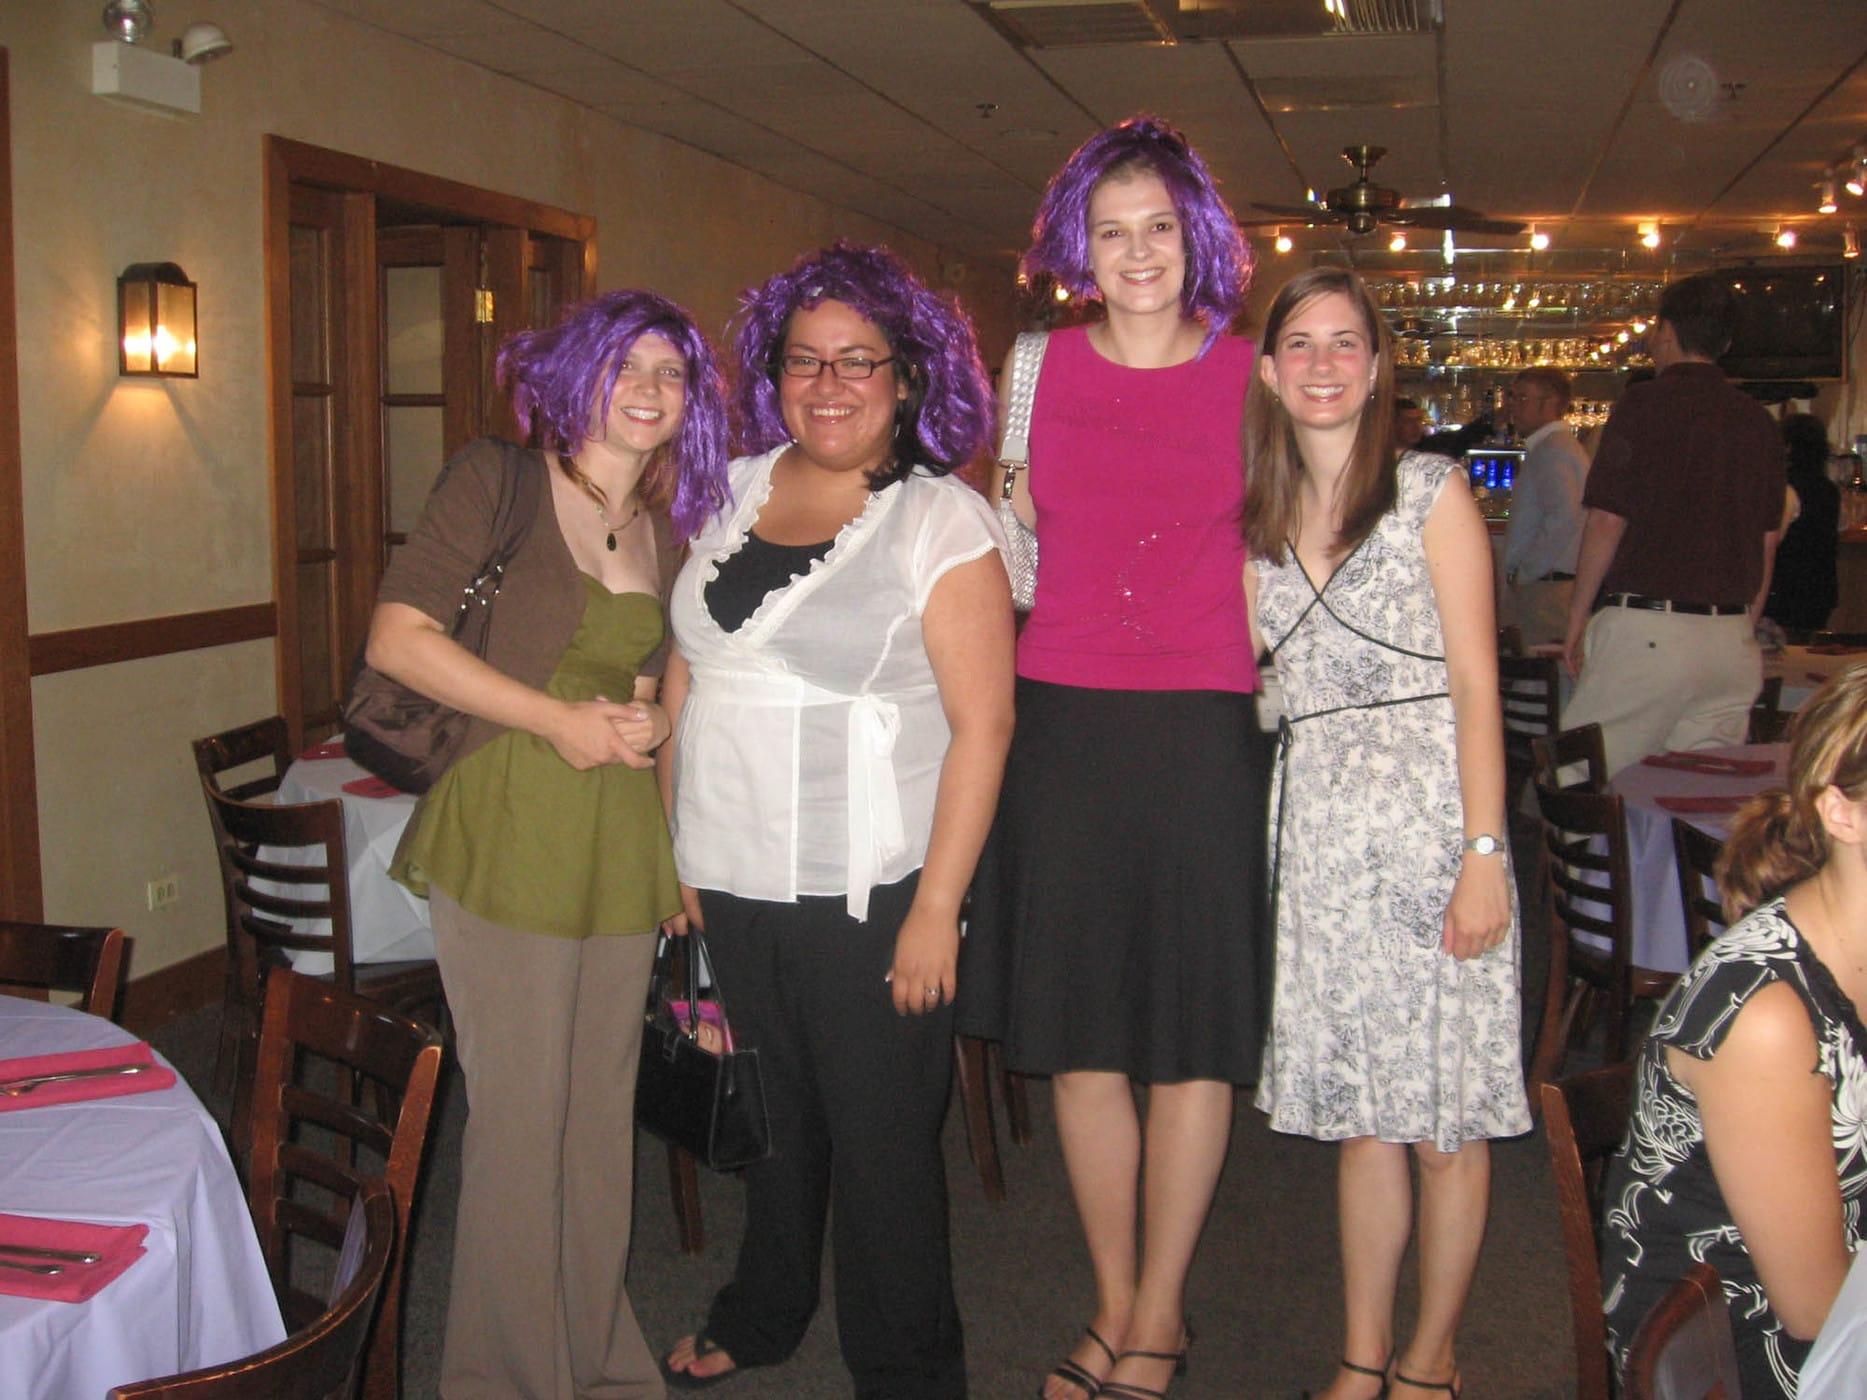 Bridesmaids in purple wigs.